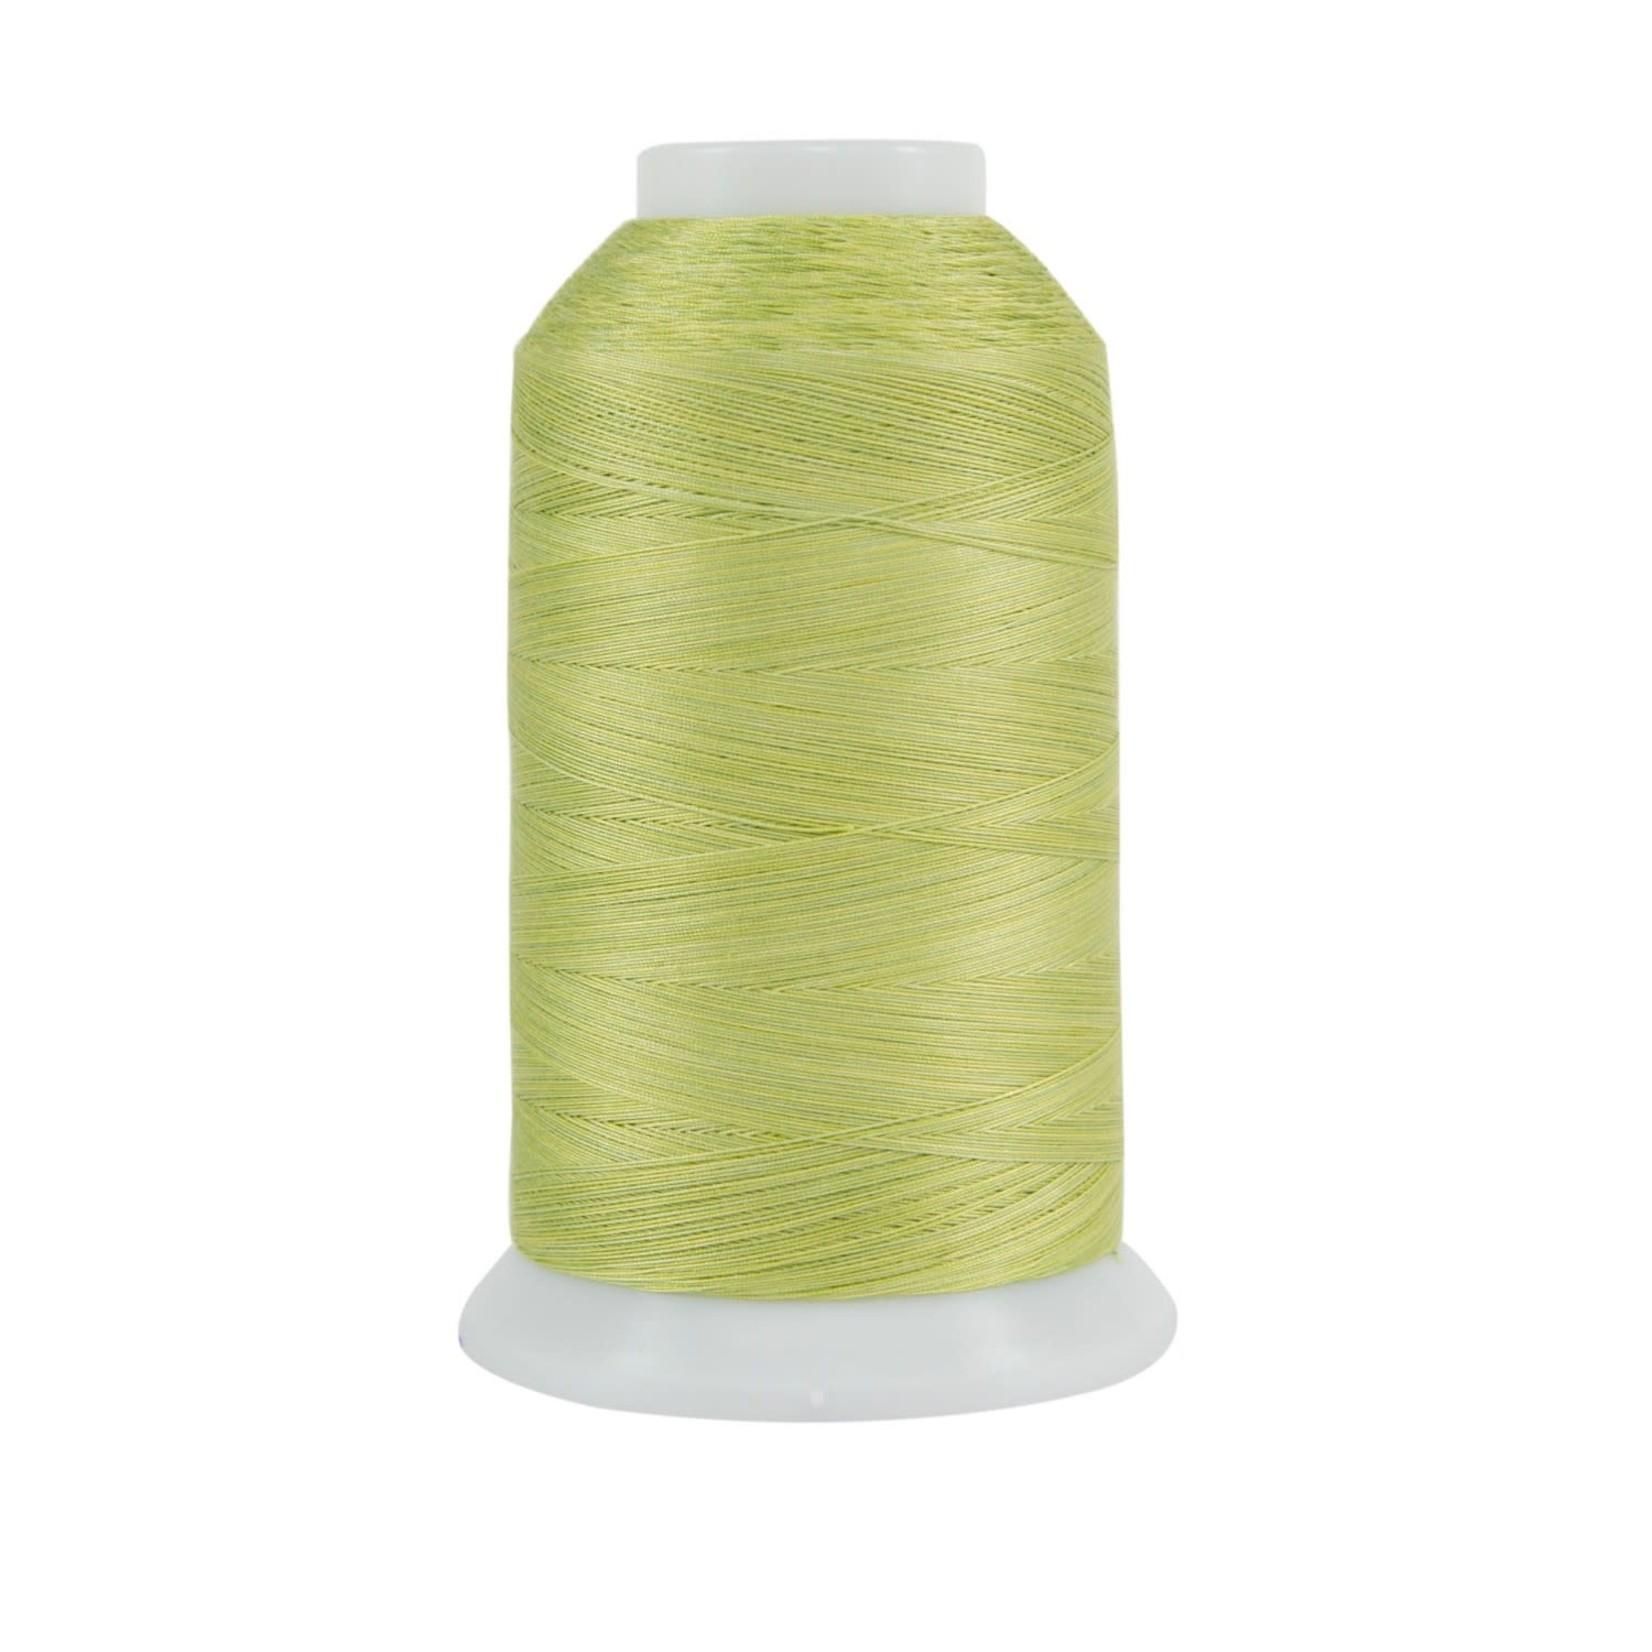 Superior Threads King Tut - #40 - 1828 m - 0969 Date Palm